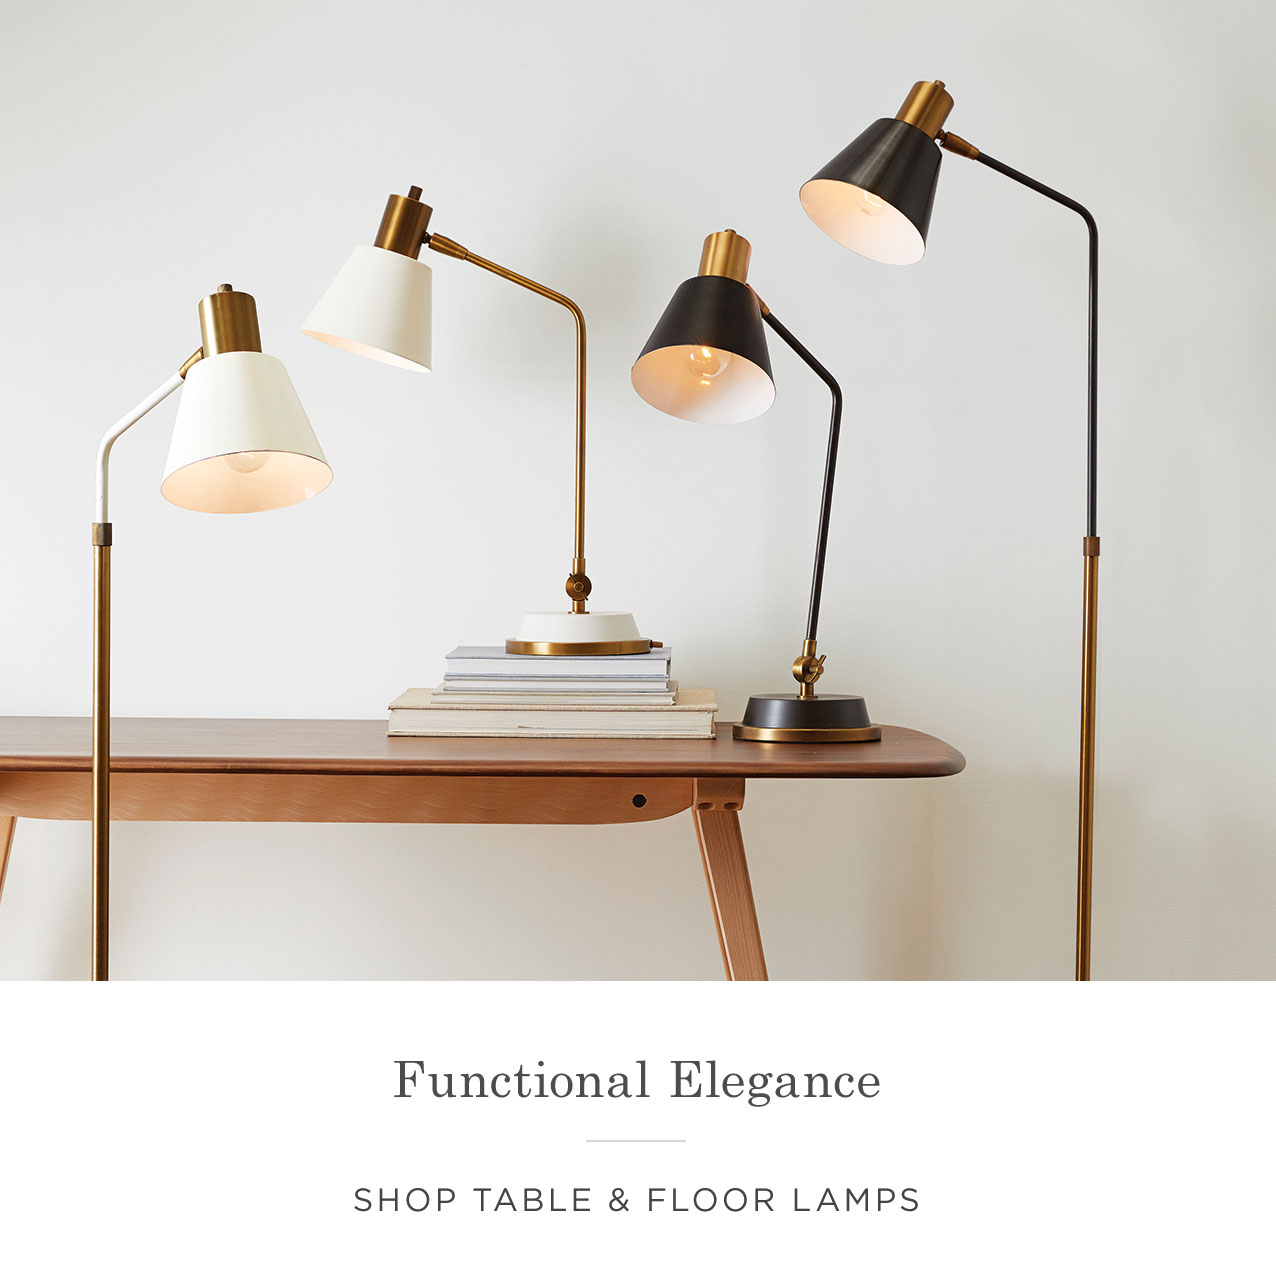 Shop Table & Floor Lamps